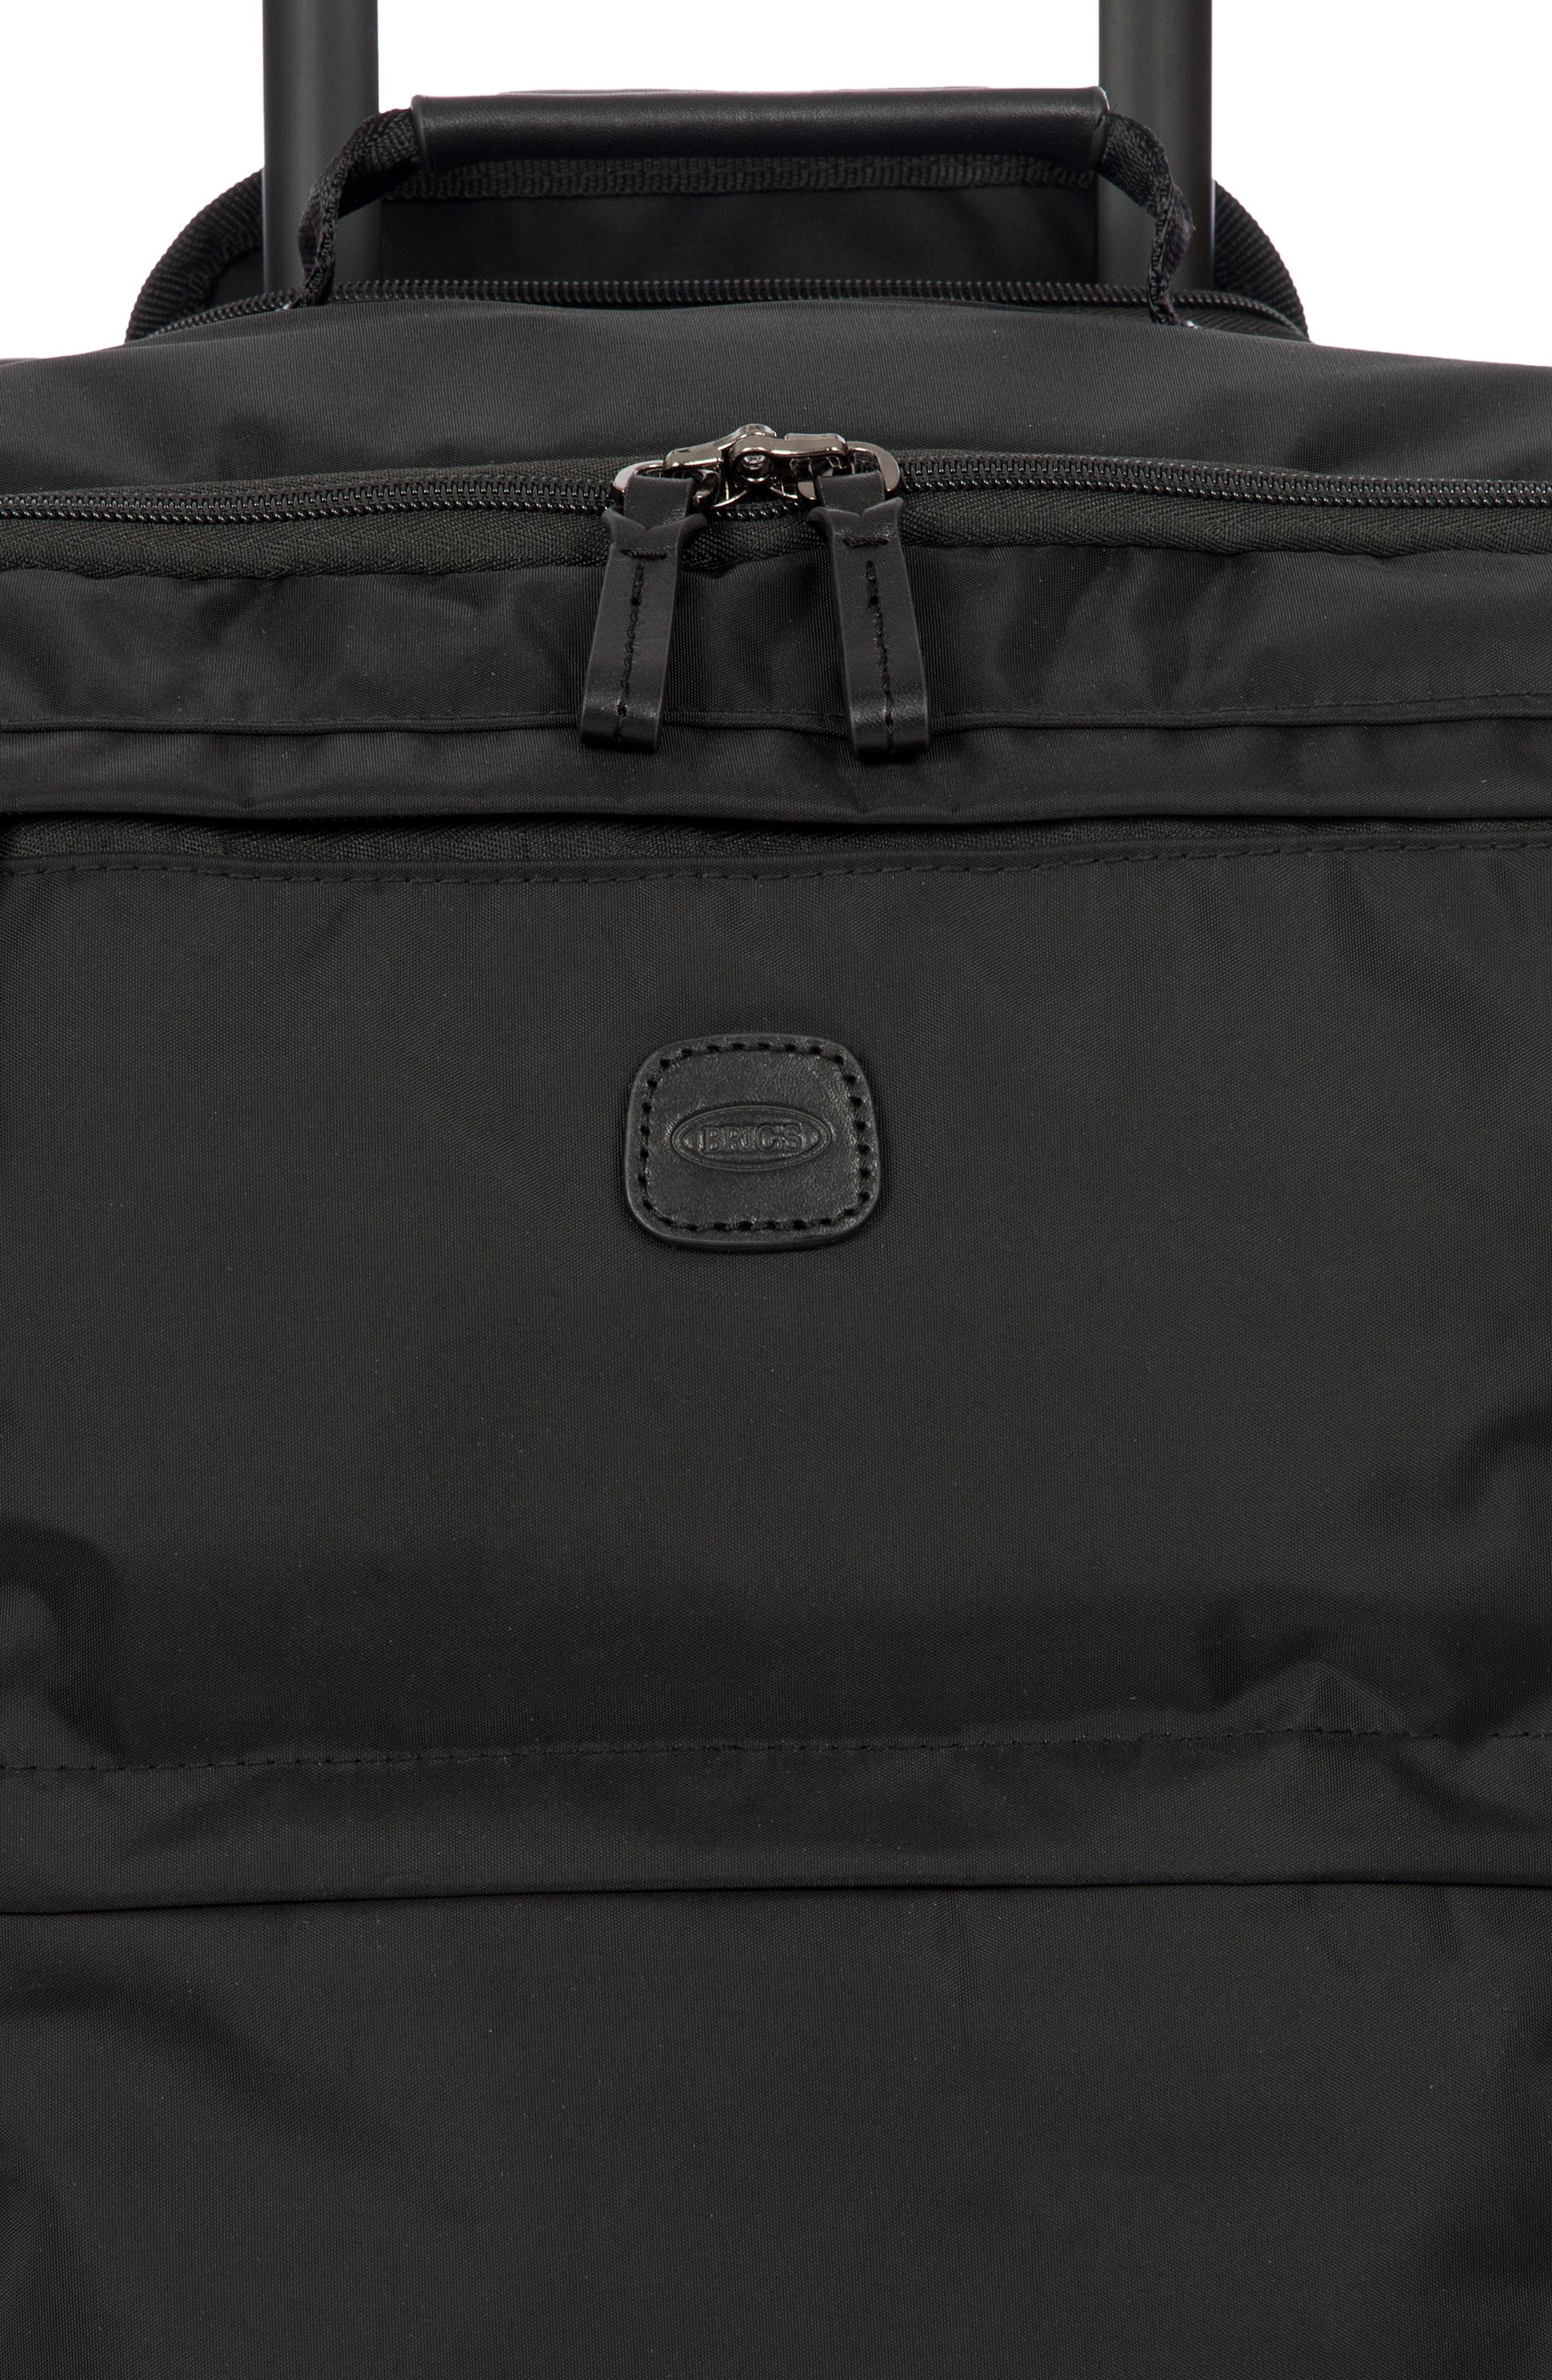 X-Bag 25-Inch Spinner Suitcase,                             Alternate thumbnail 5, color,                             BLACK/ BLACK